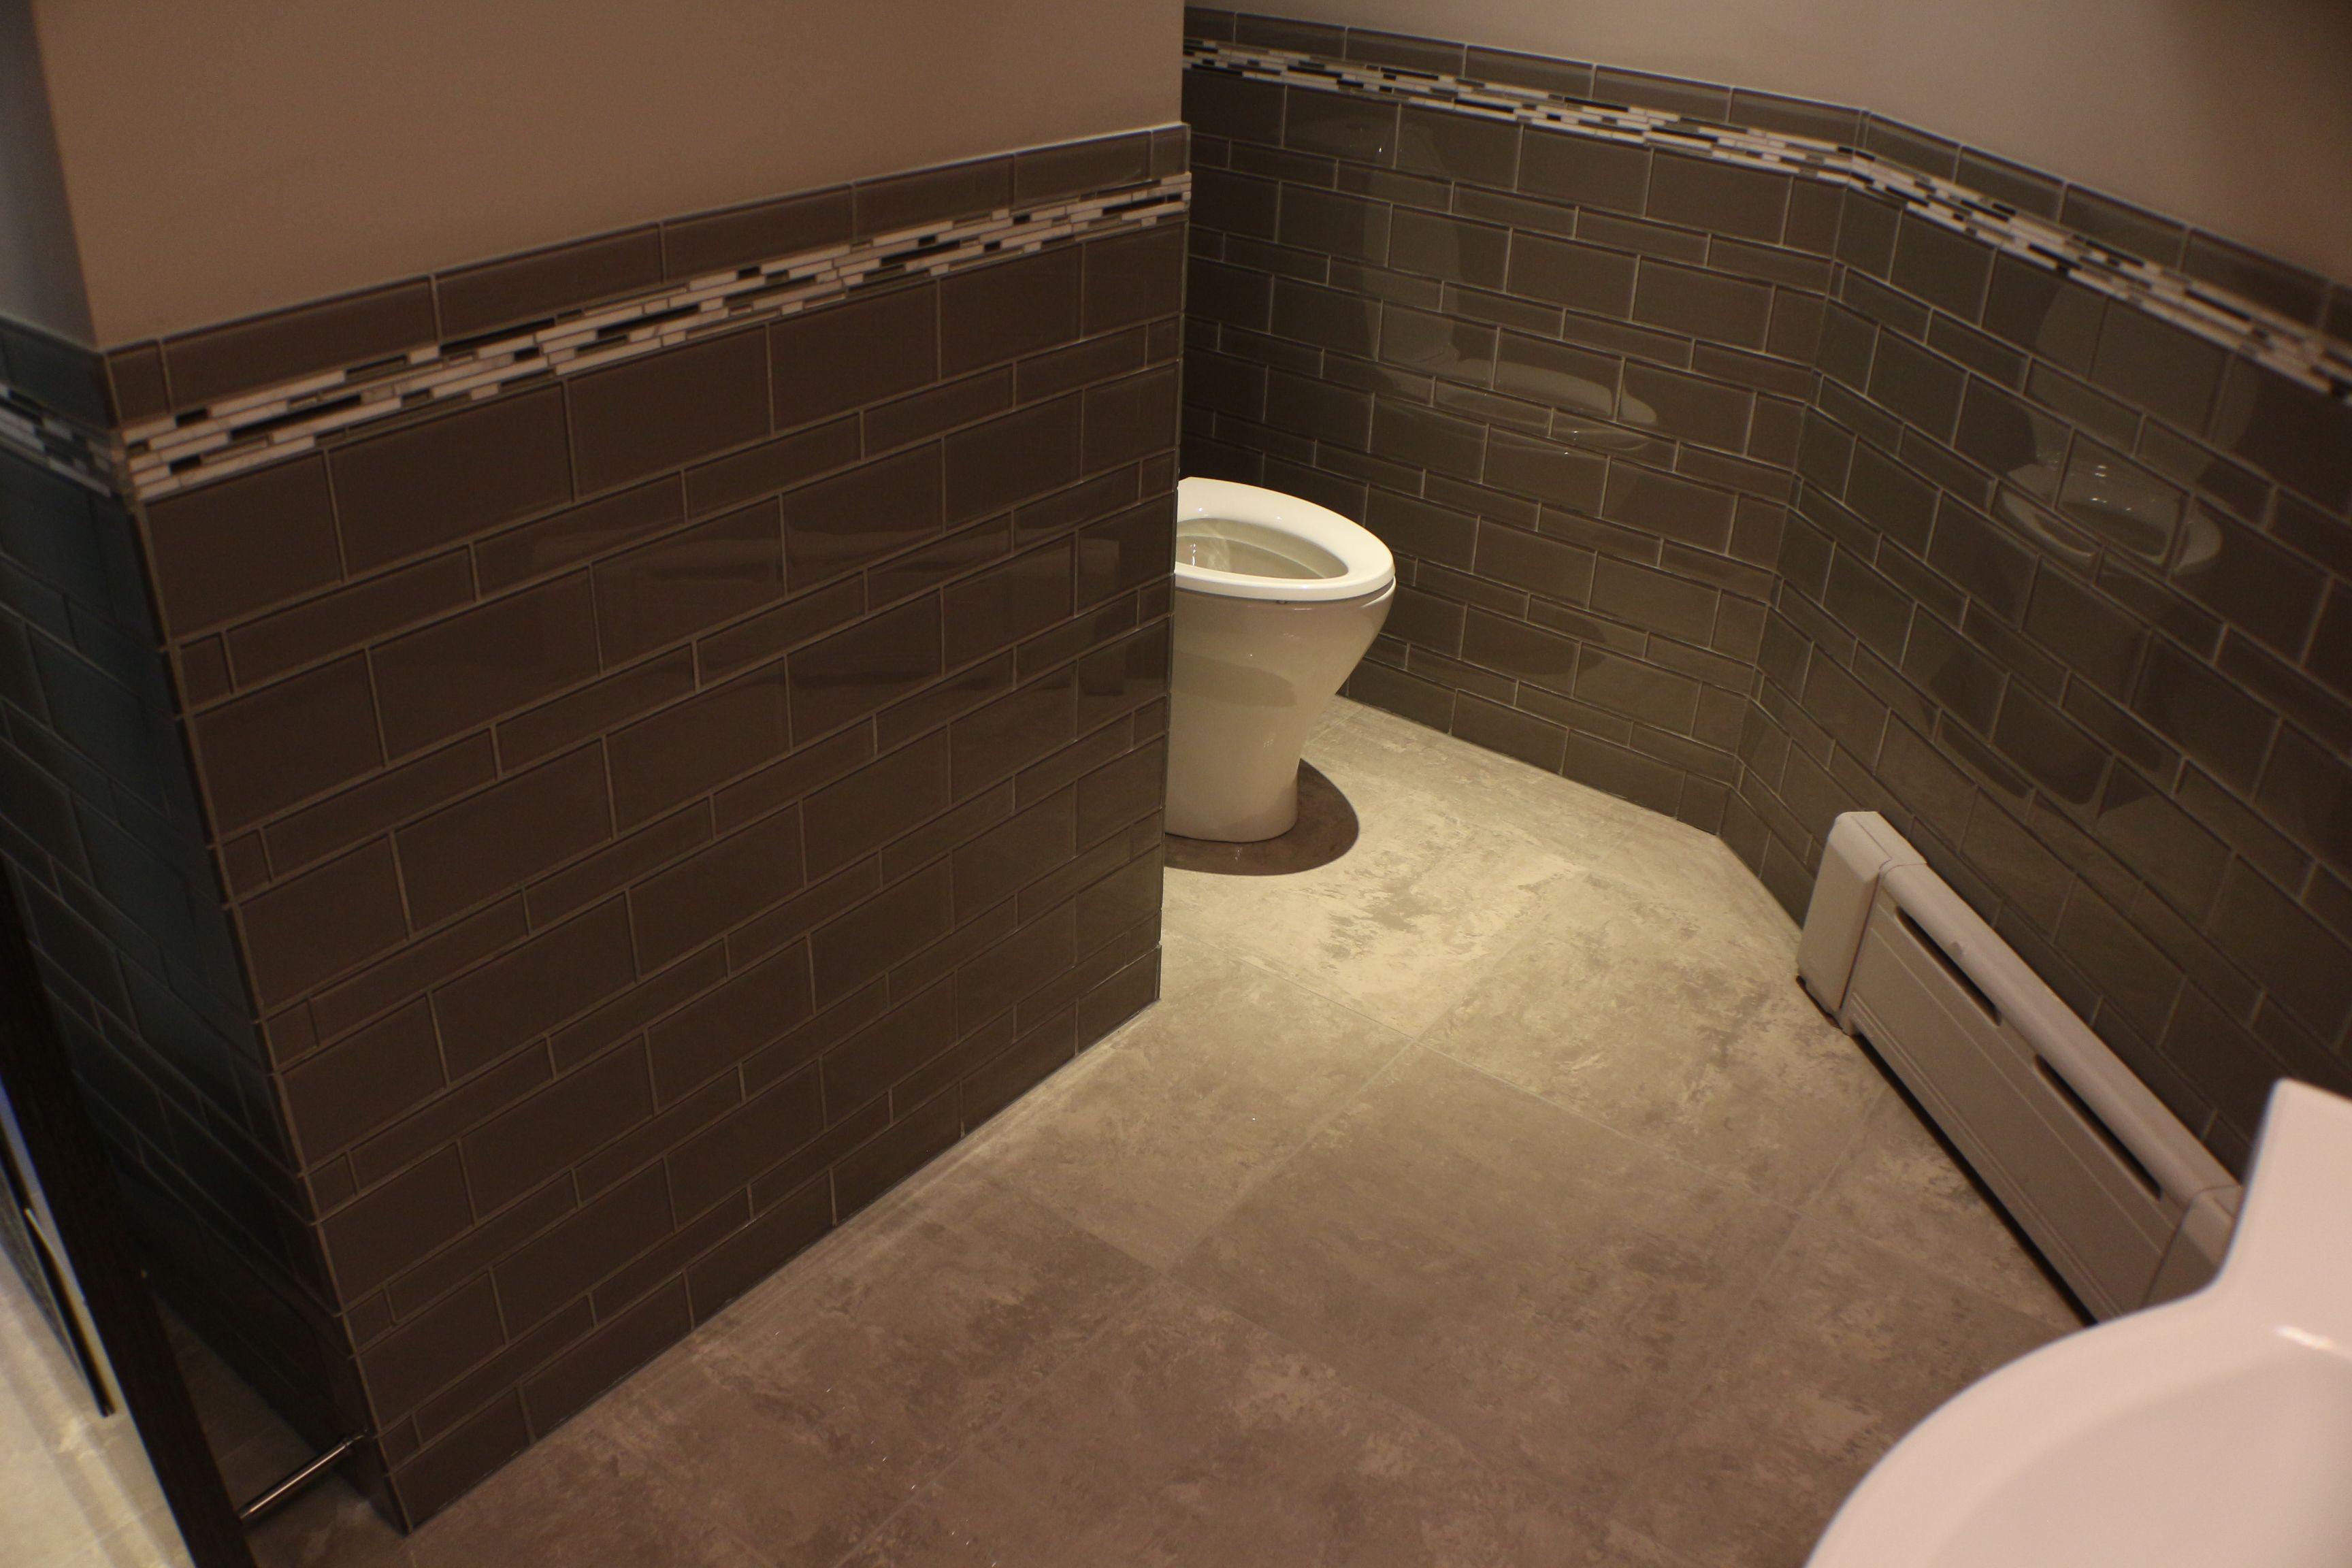 Unique bathroom design using a glass tile wainscoting customer